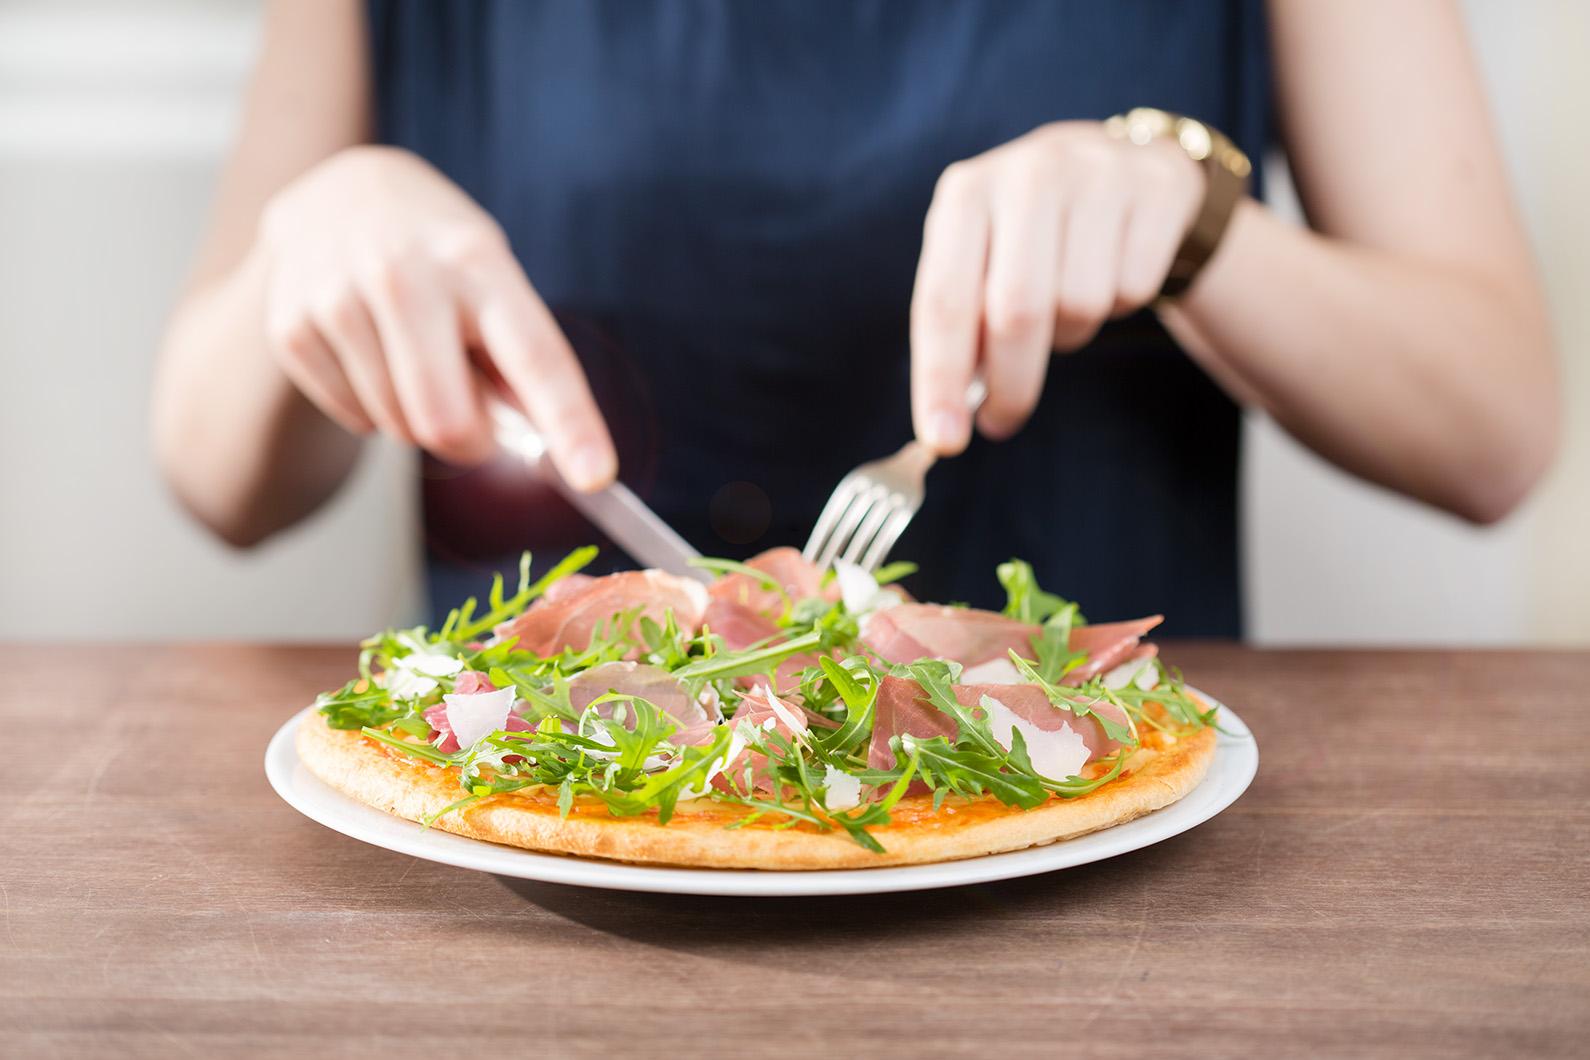 Fotos de MUNDFEIN Pizzawerkstatt Bad Segeberg